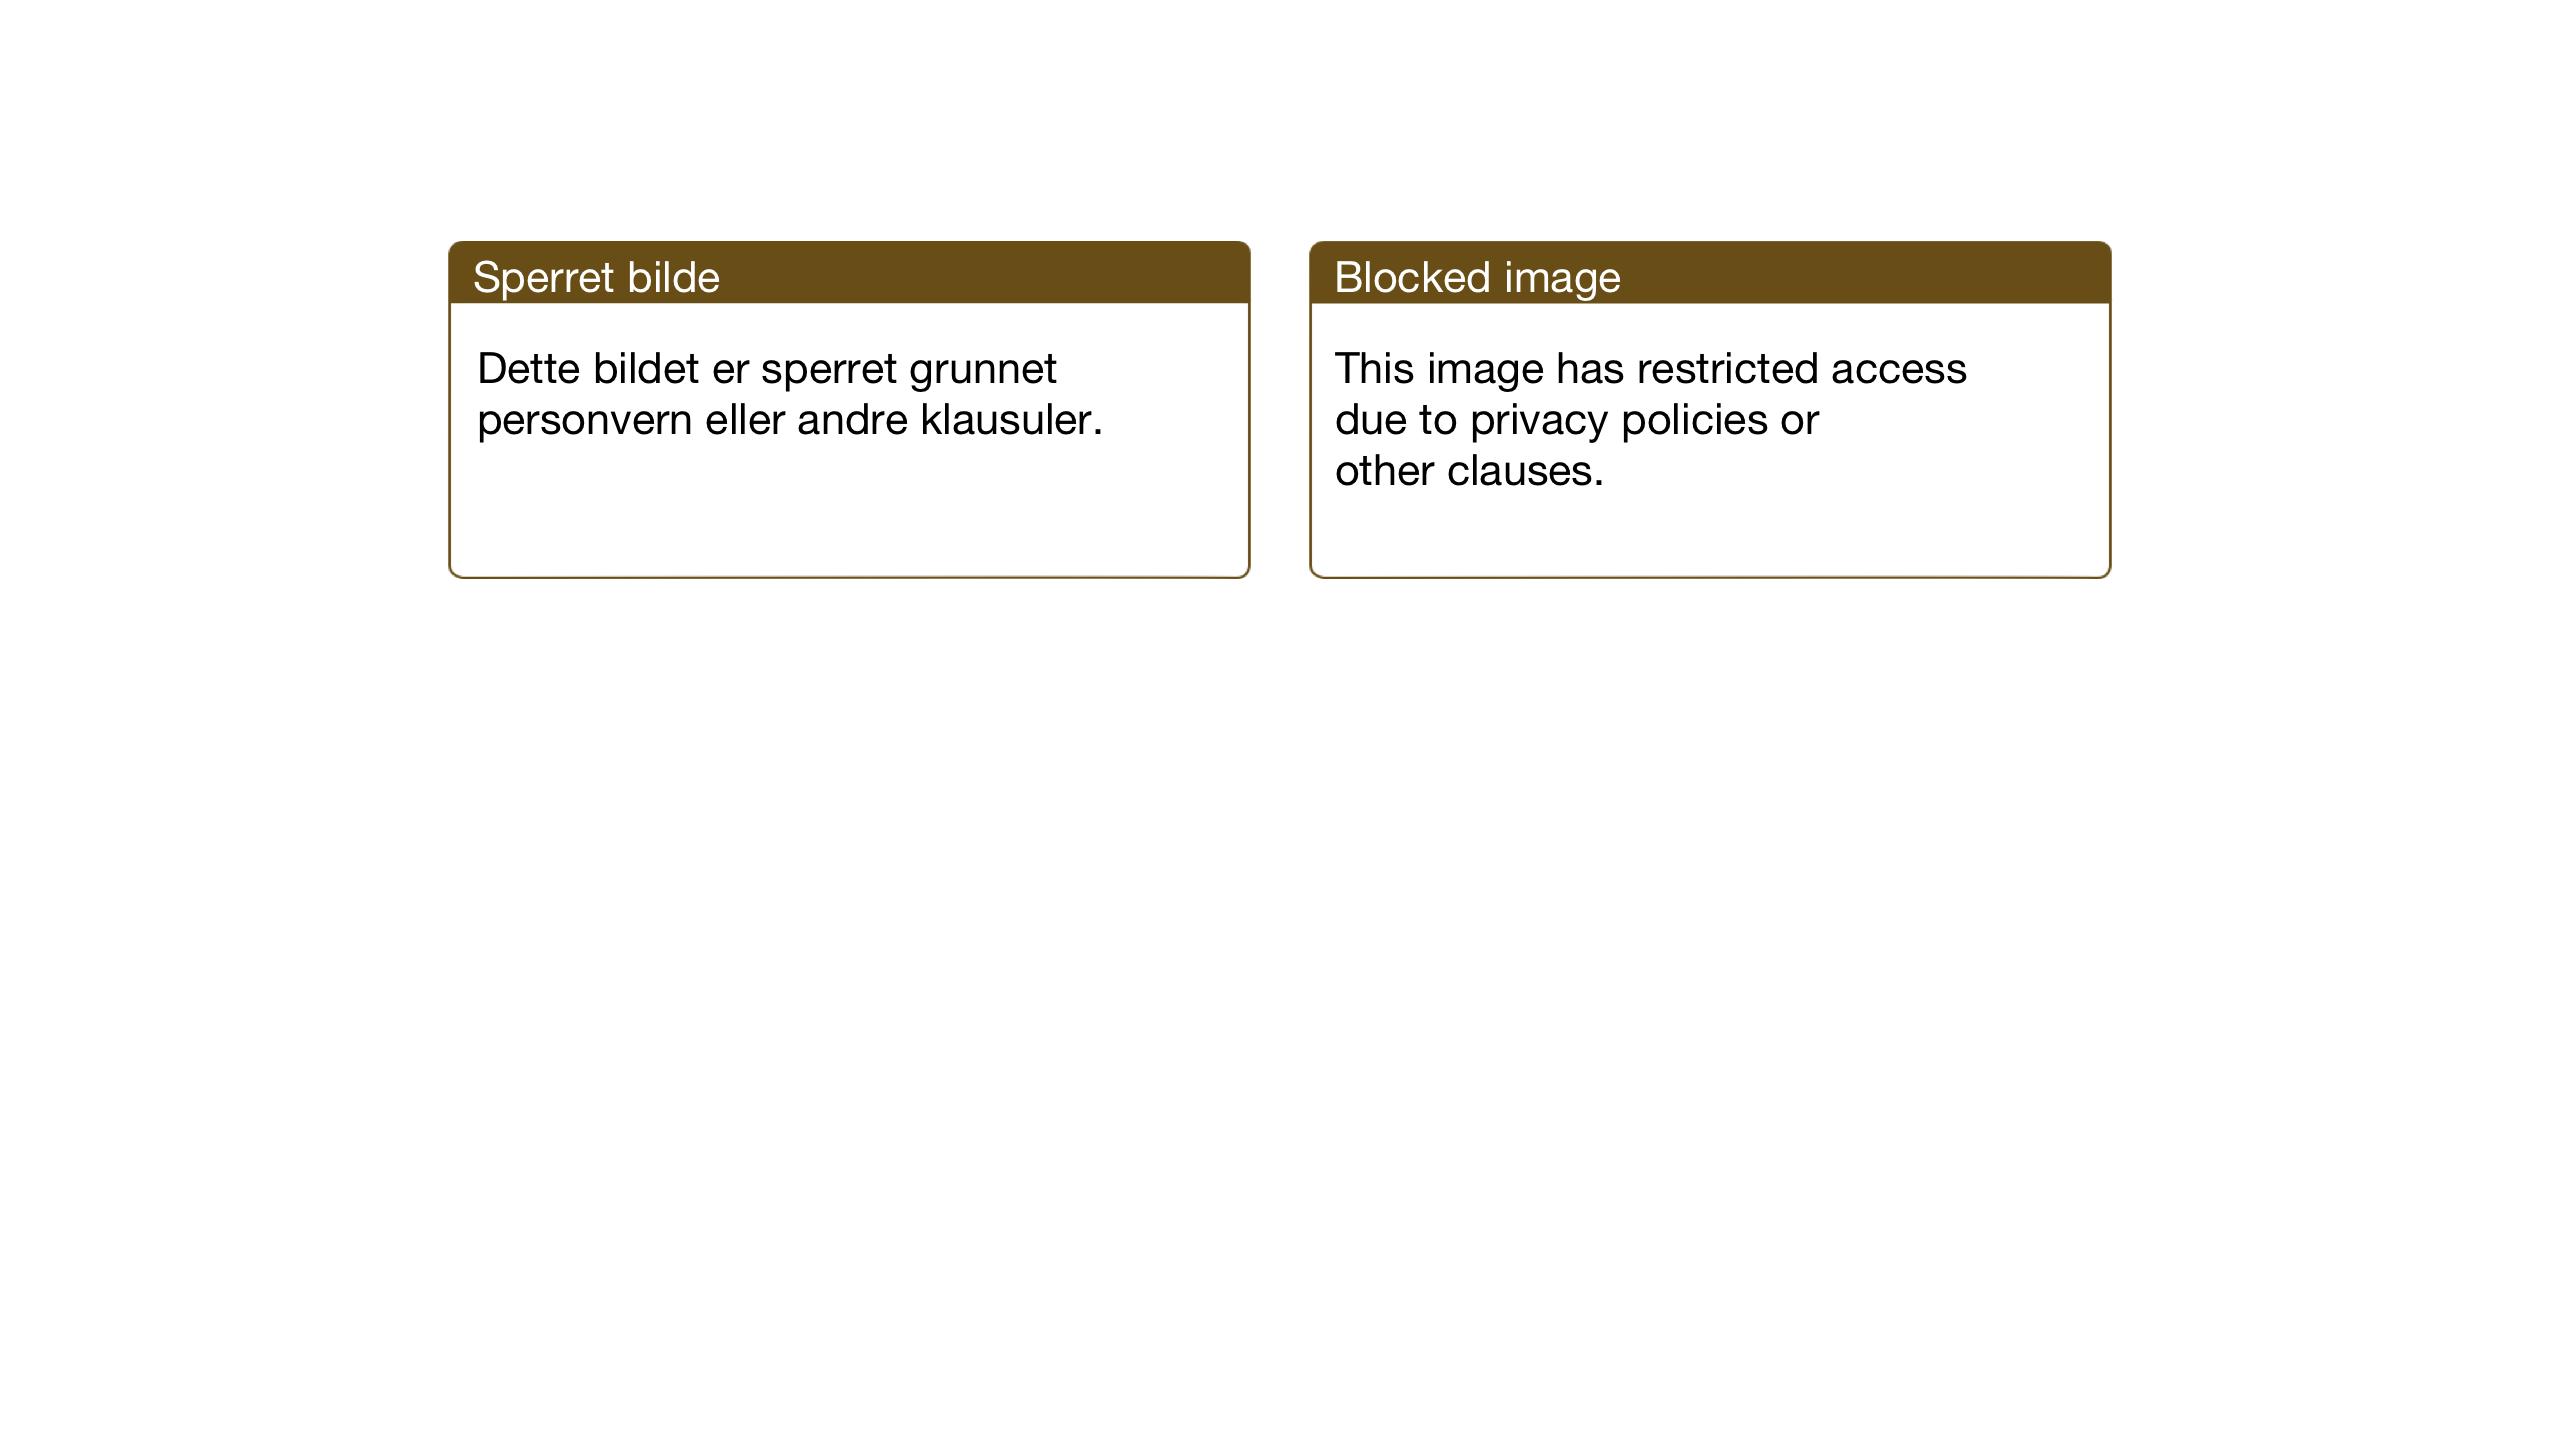 SAB, Domkirken Sokneprestembete, H/Haa: Ministerialbok nr. C 9, 1958-2001, s. 176b-177a